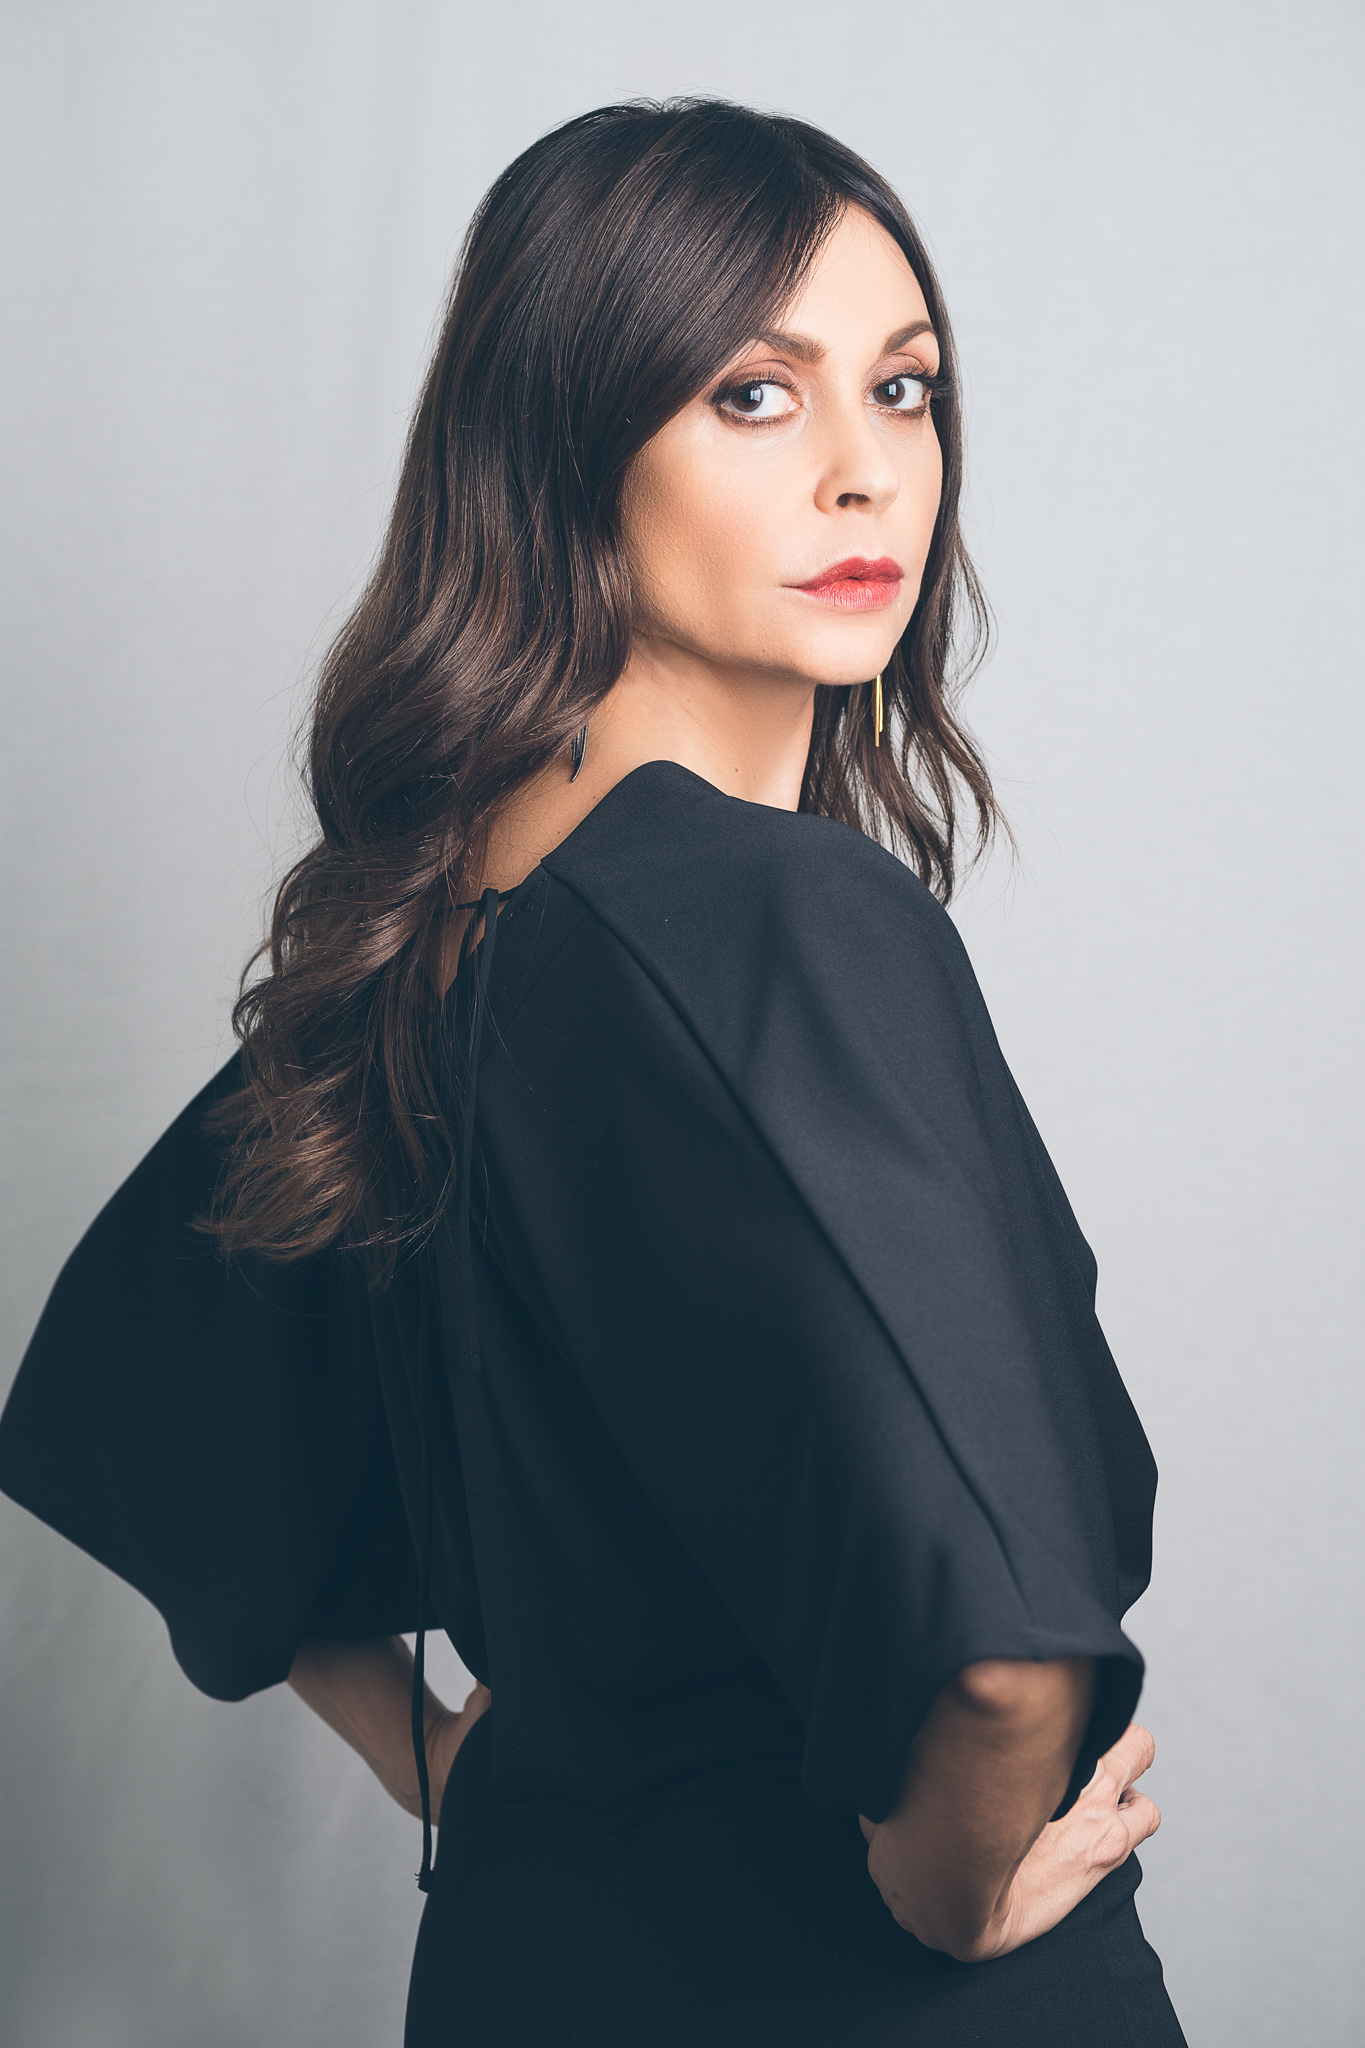 Ritratti_Elda Alvigini2018 (3)